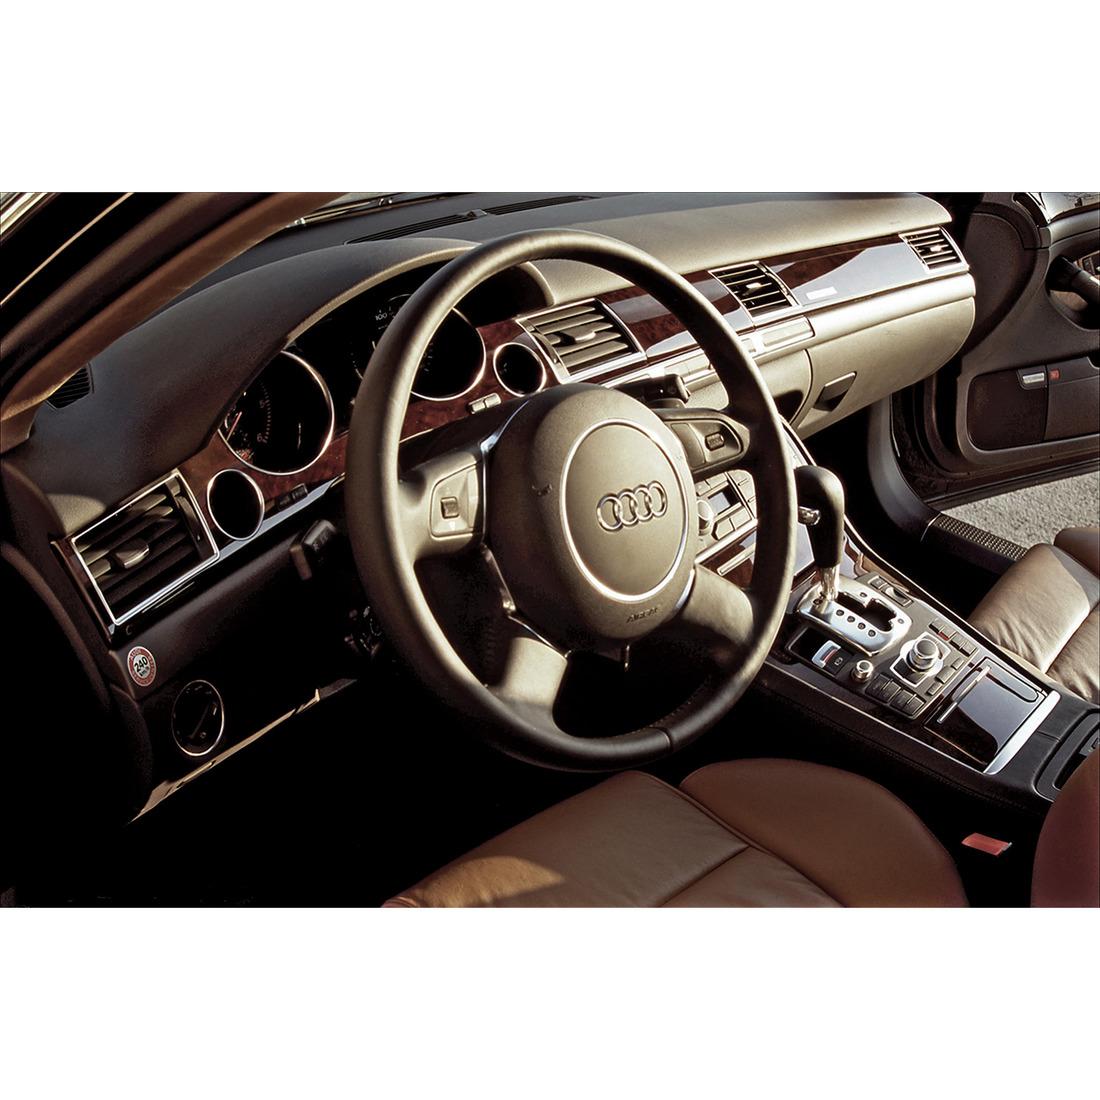 LT_19_Audi_1100x